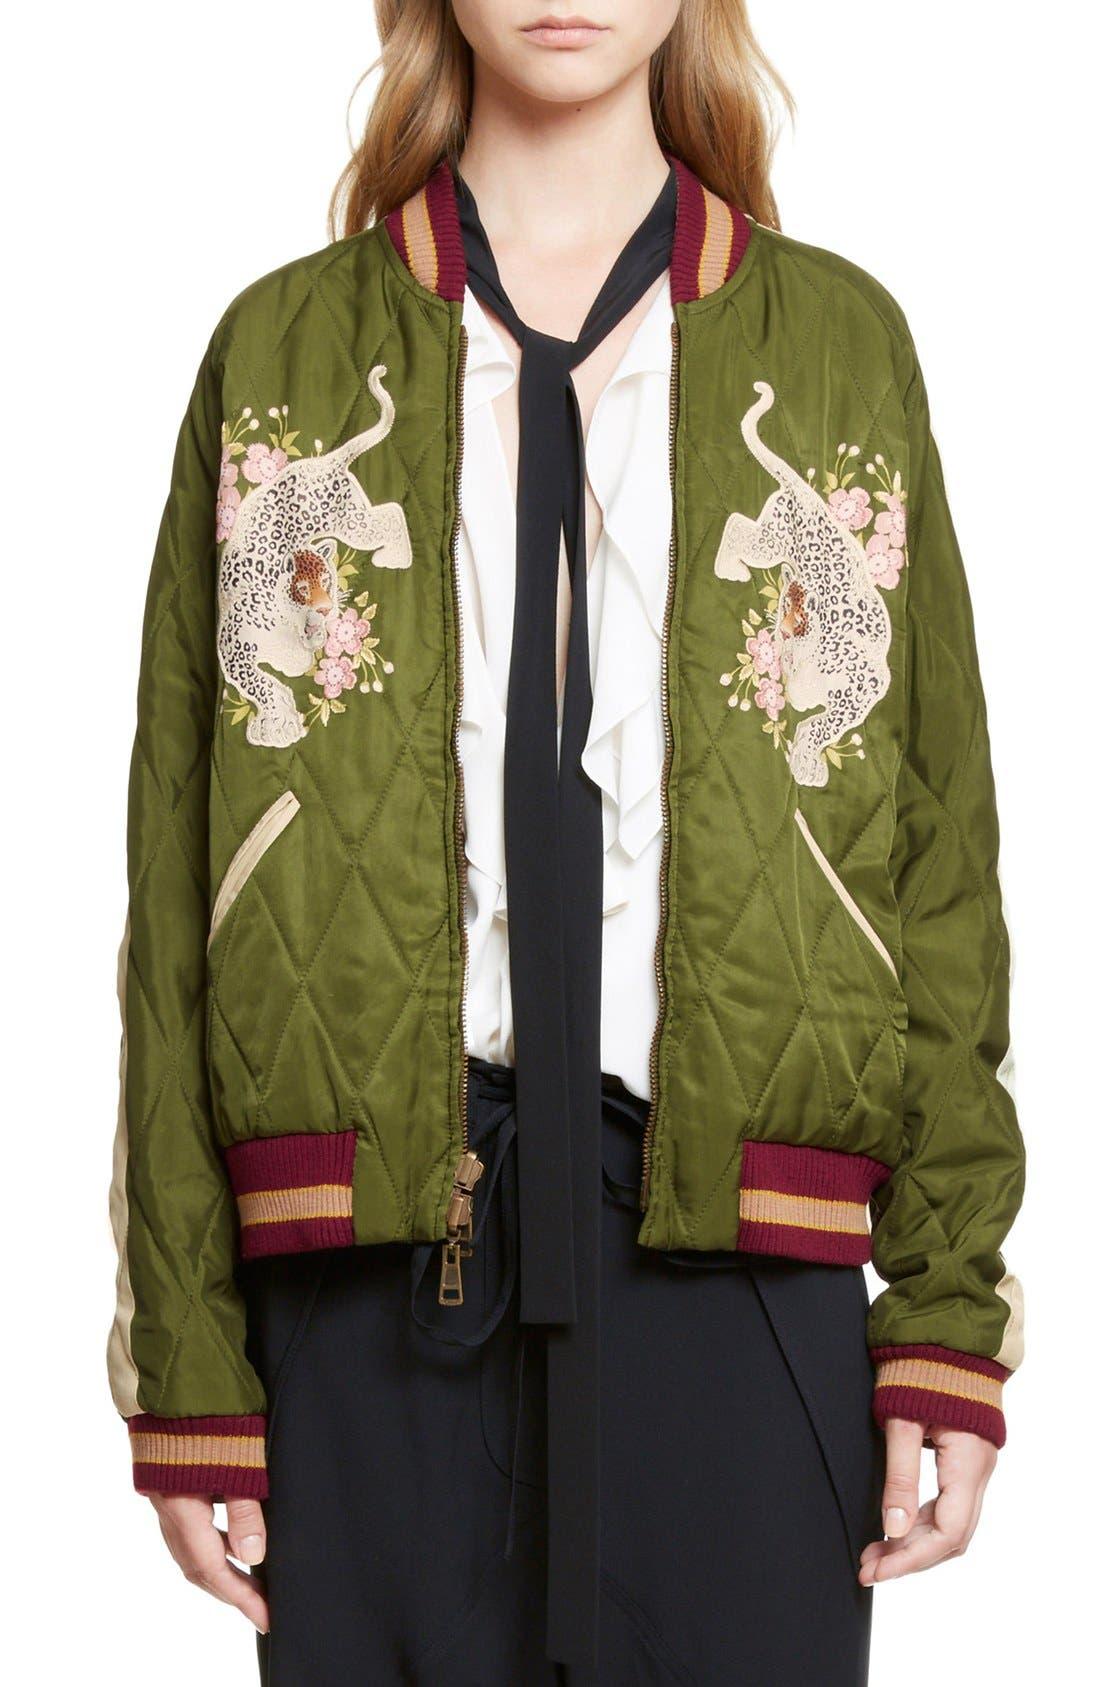 CHLOÉ, Reversible Embroidered Tech Satin Bomber Jacket, Main thumbnail 1, color, 301